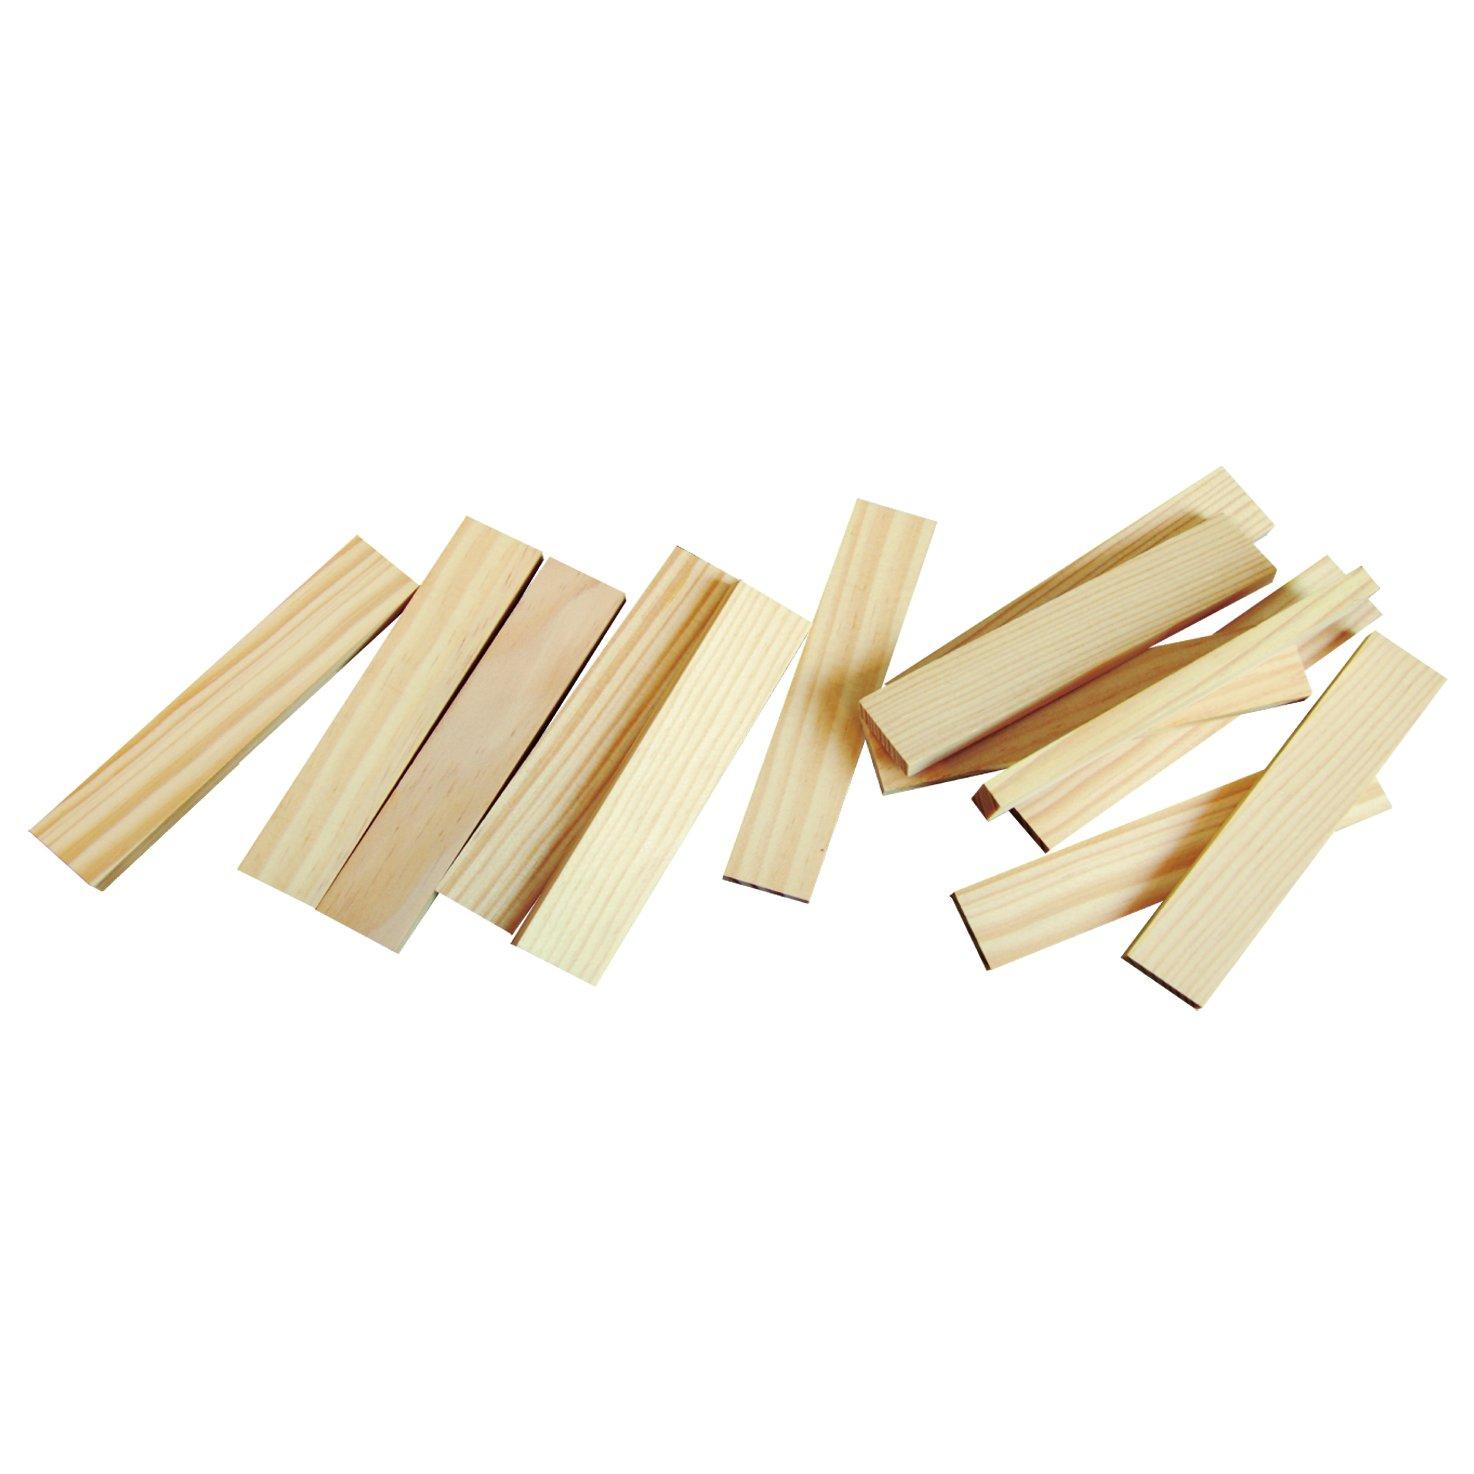 KEVA Contraptions 400 Plank Set